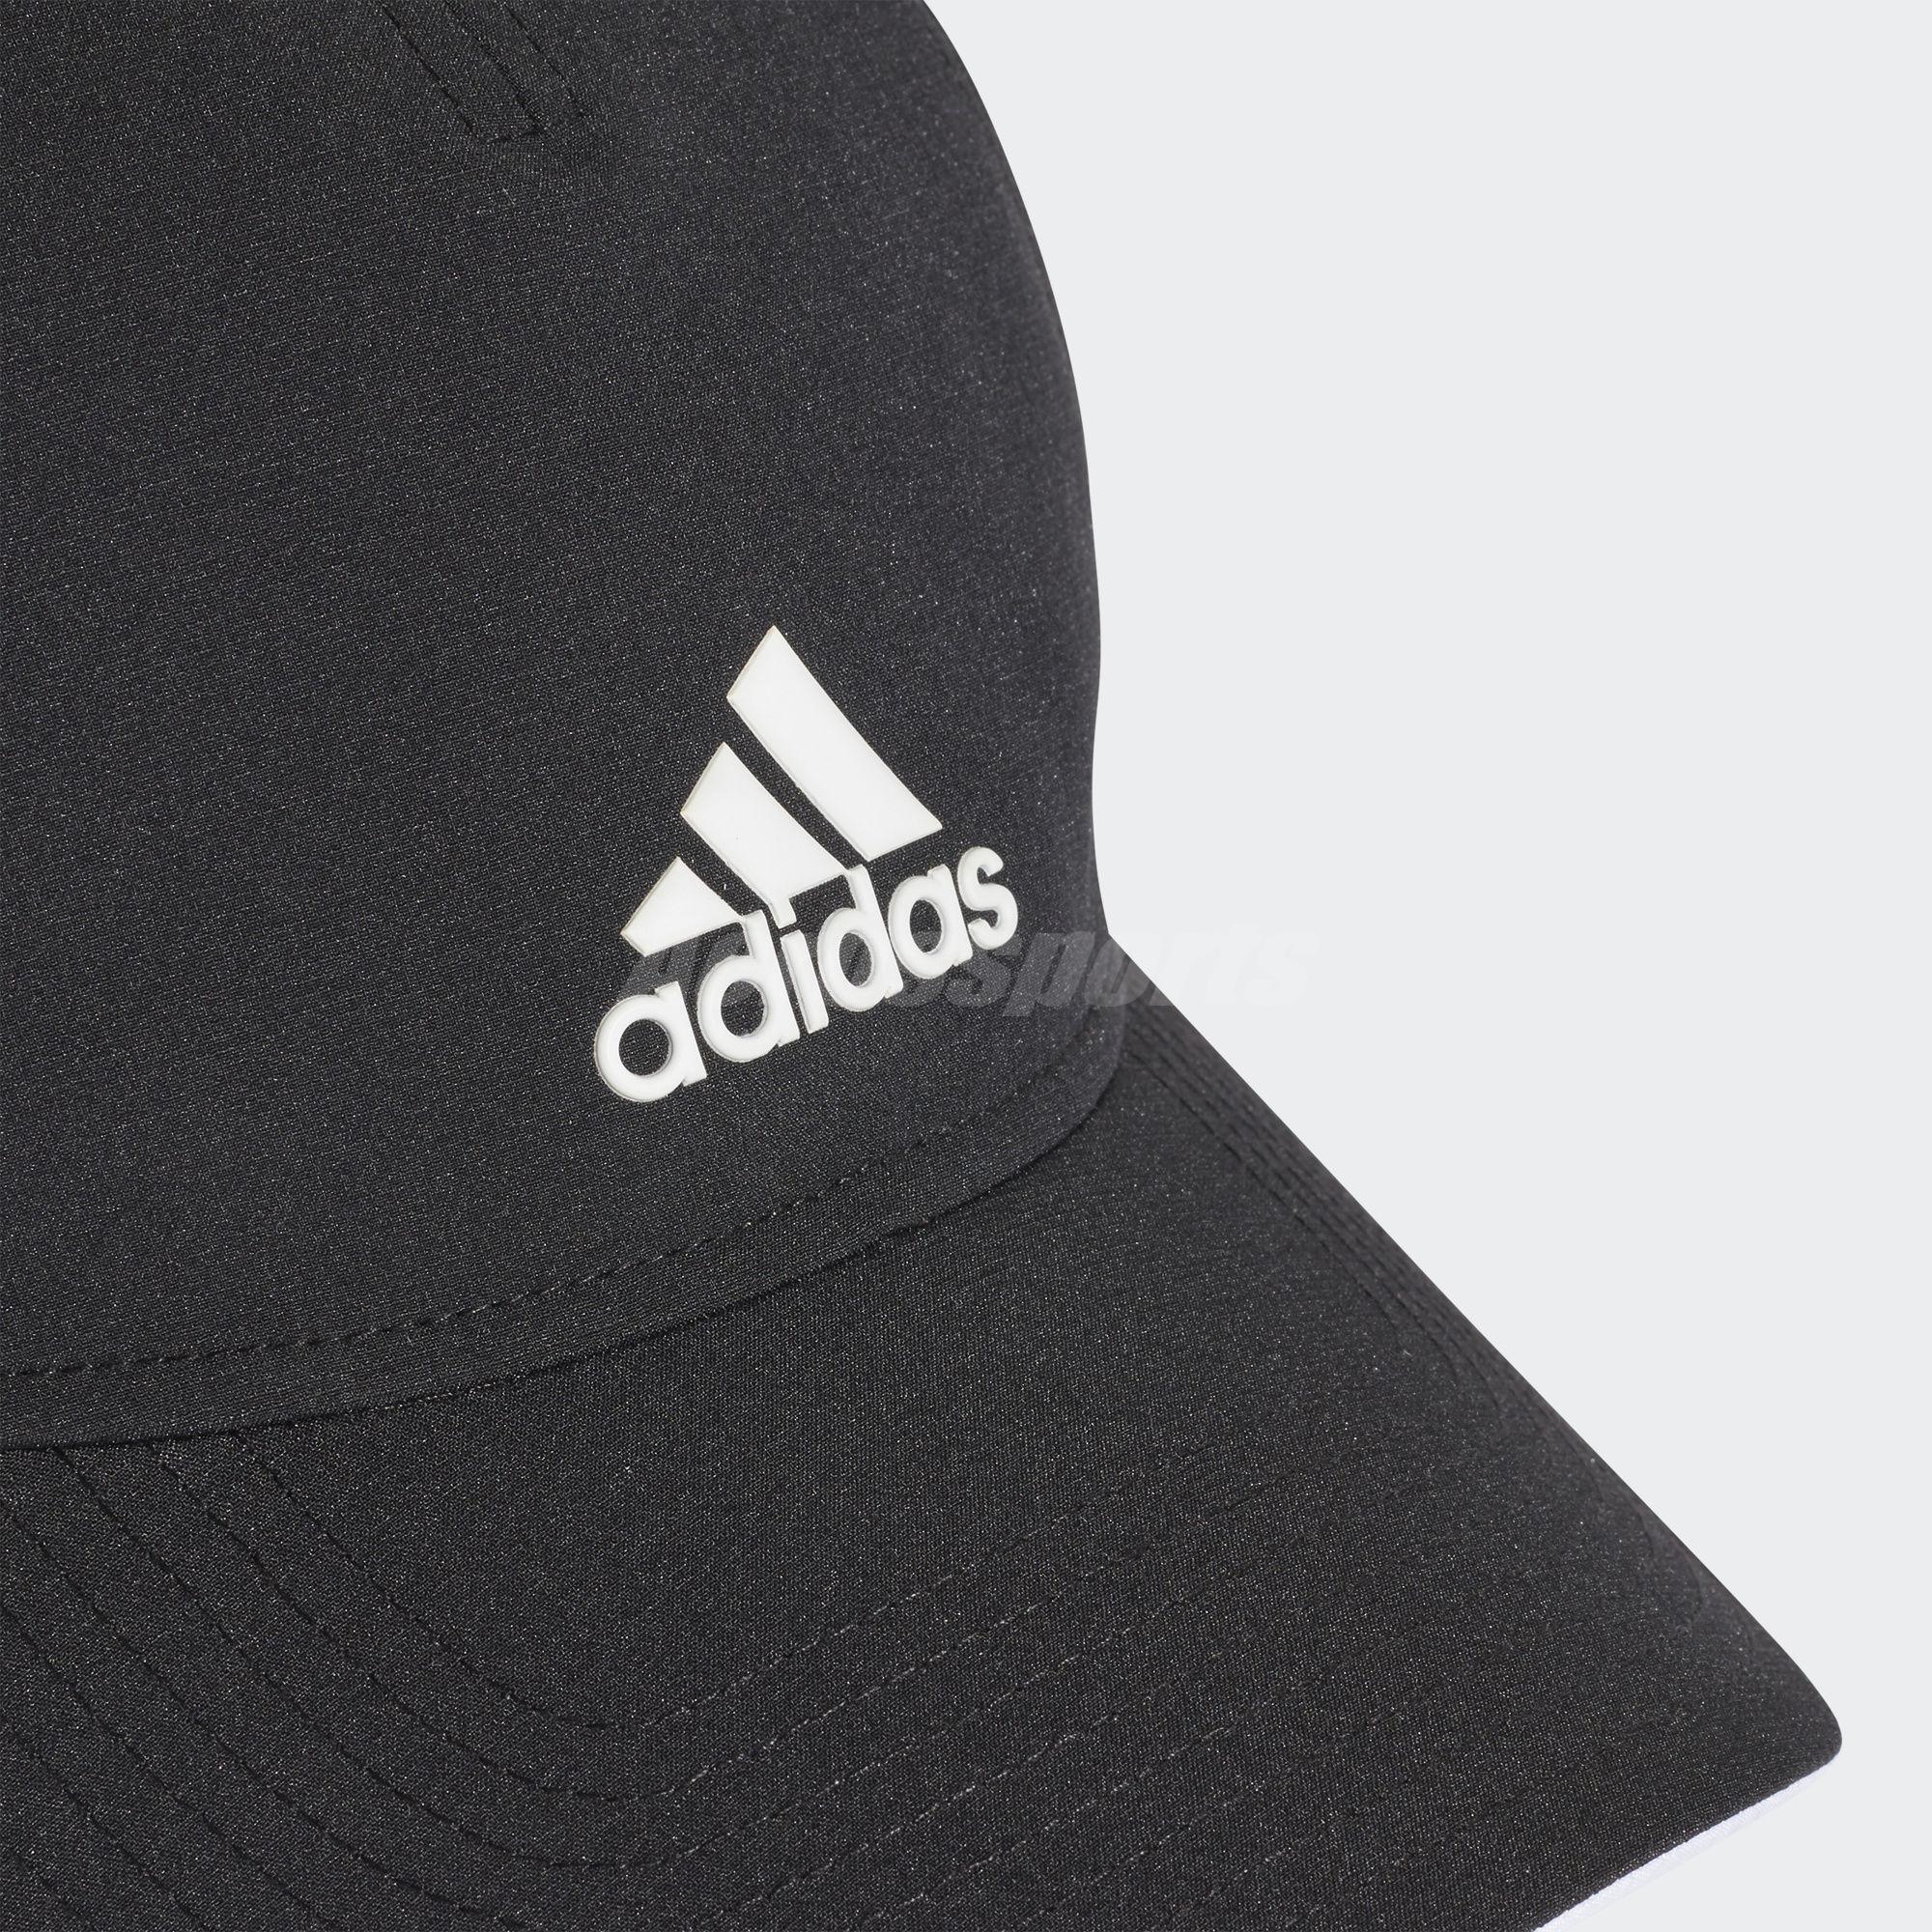 adidas Unisex C40 Climalite Cap Black White Baseball Hat Sport ... ee1922d0804a